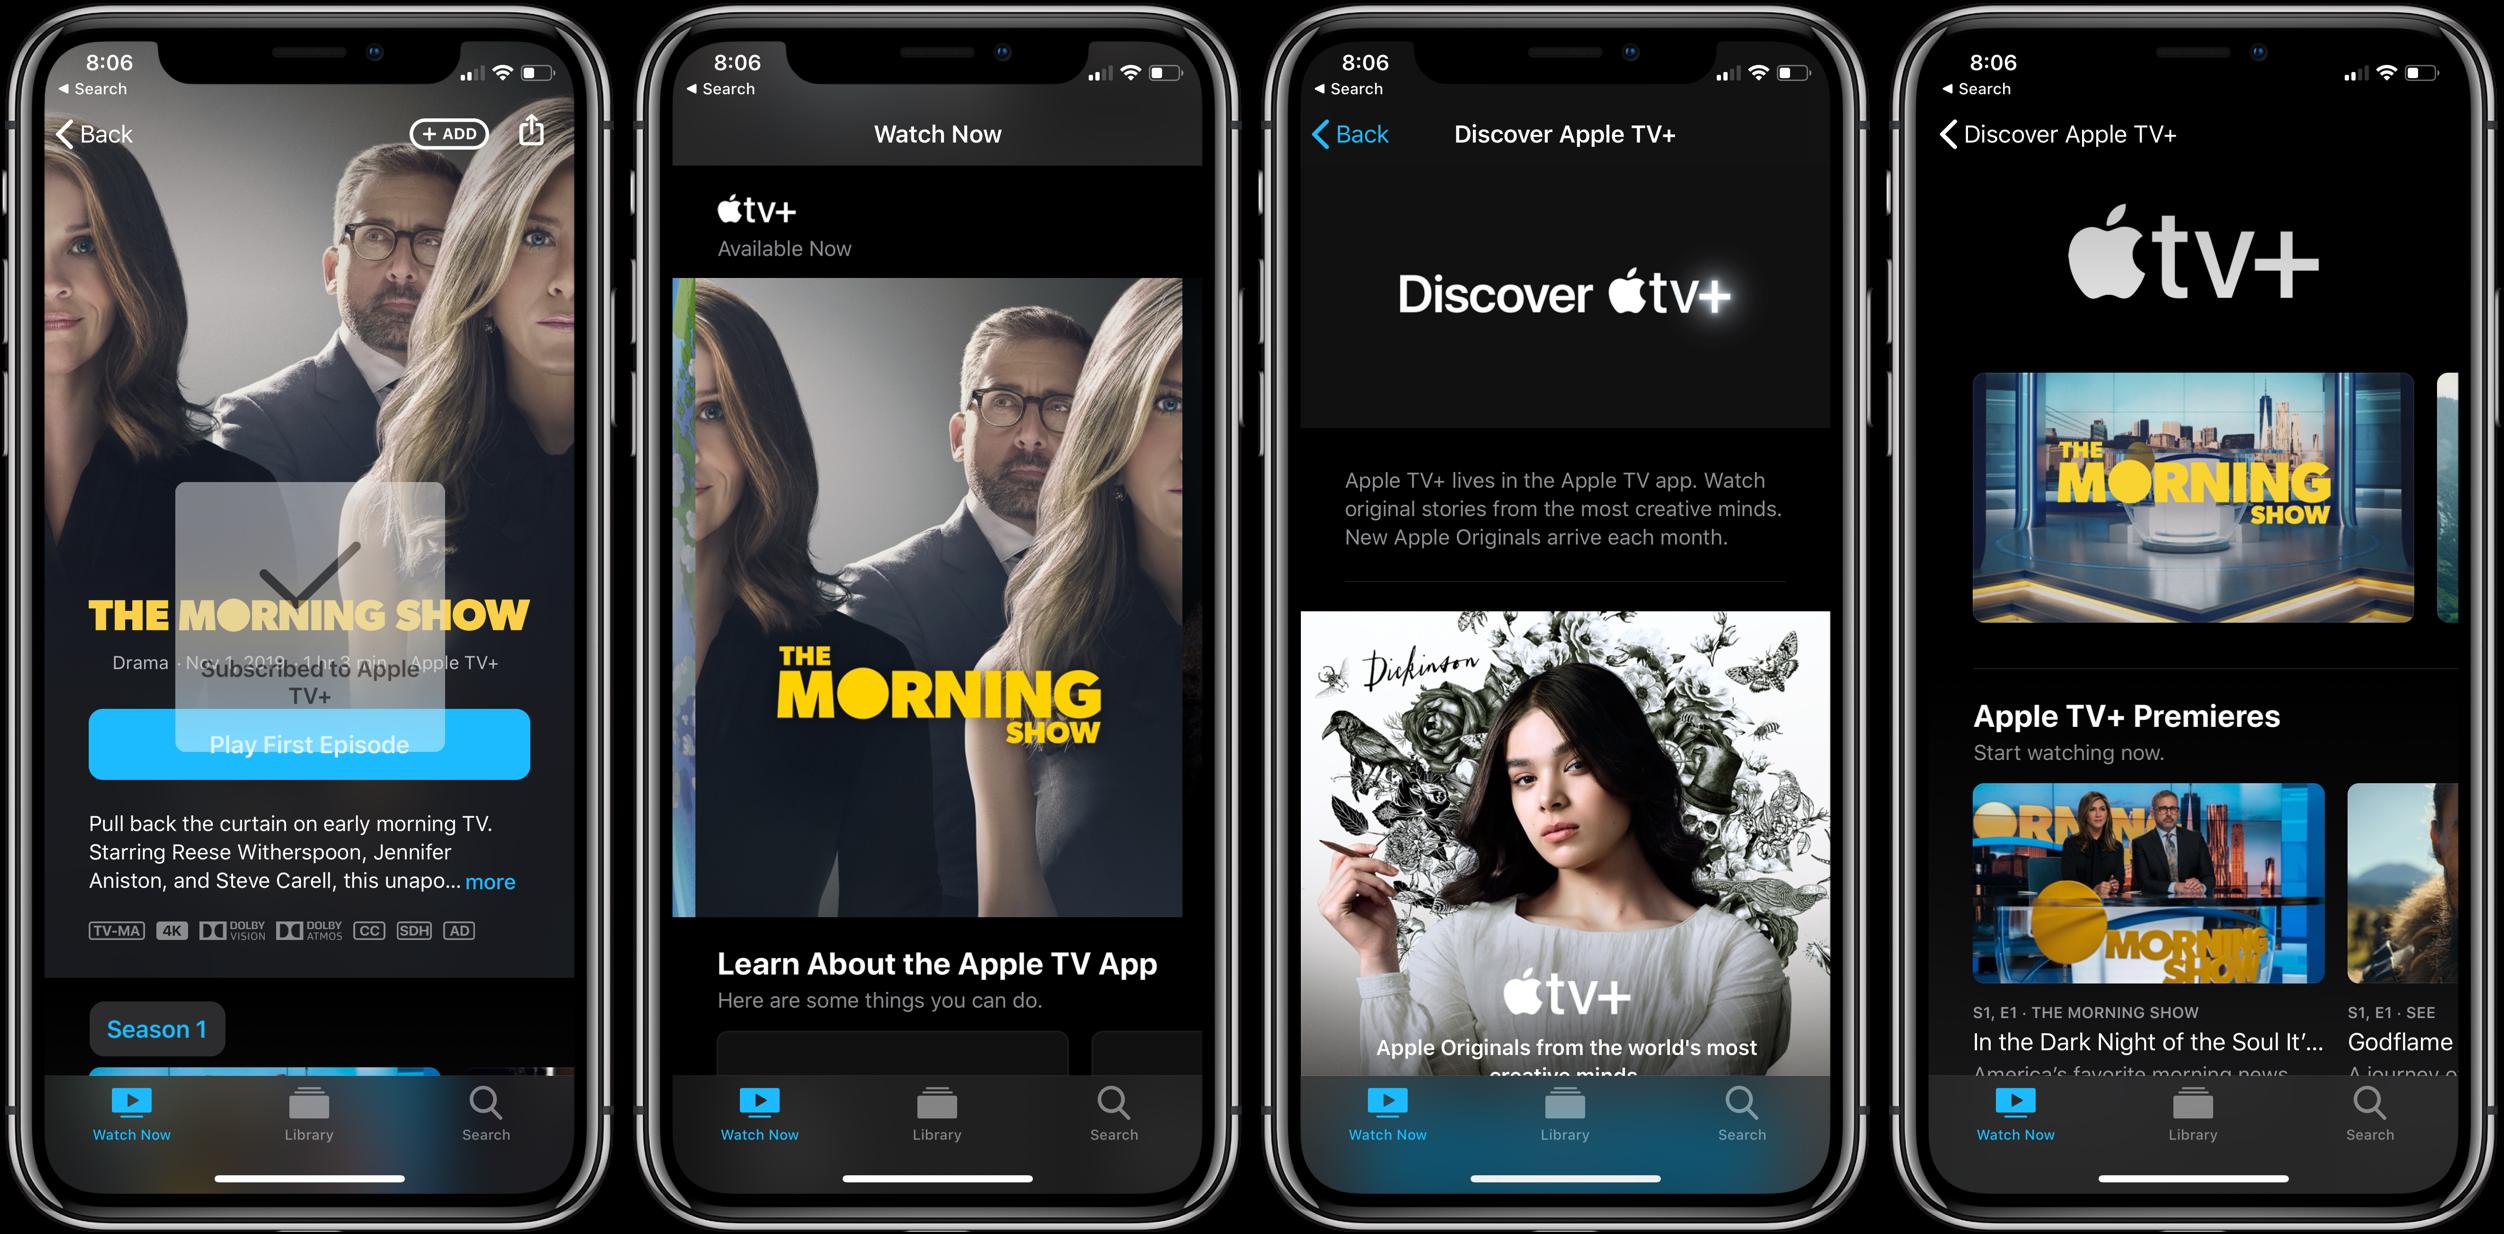 How to get free year Apple TV+ walkthrough 2